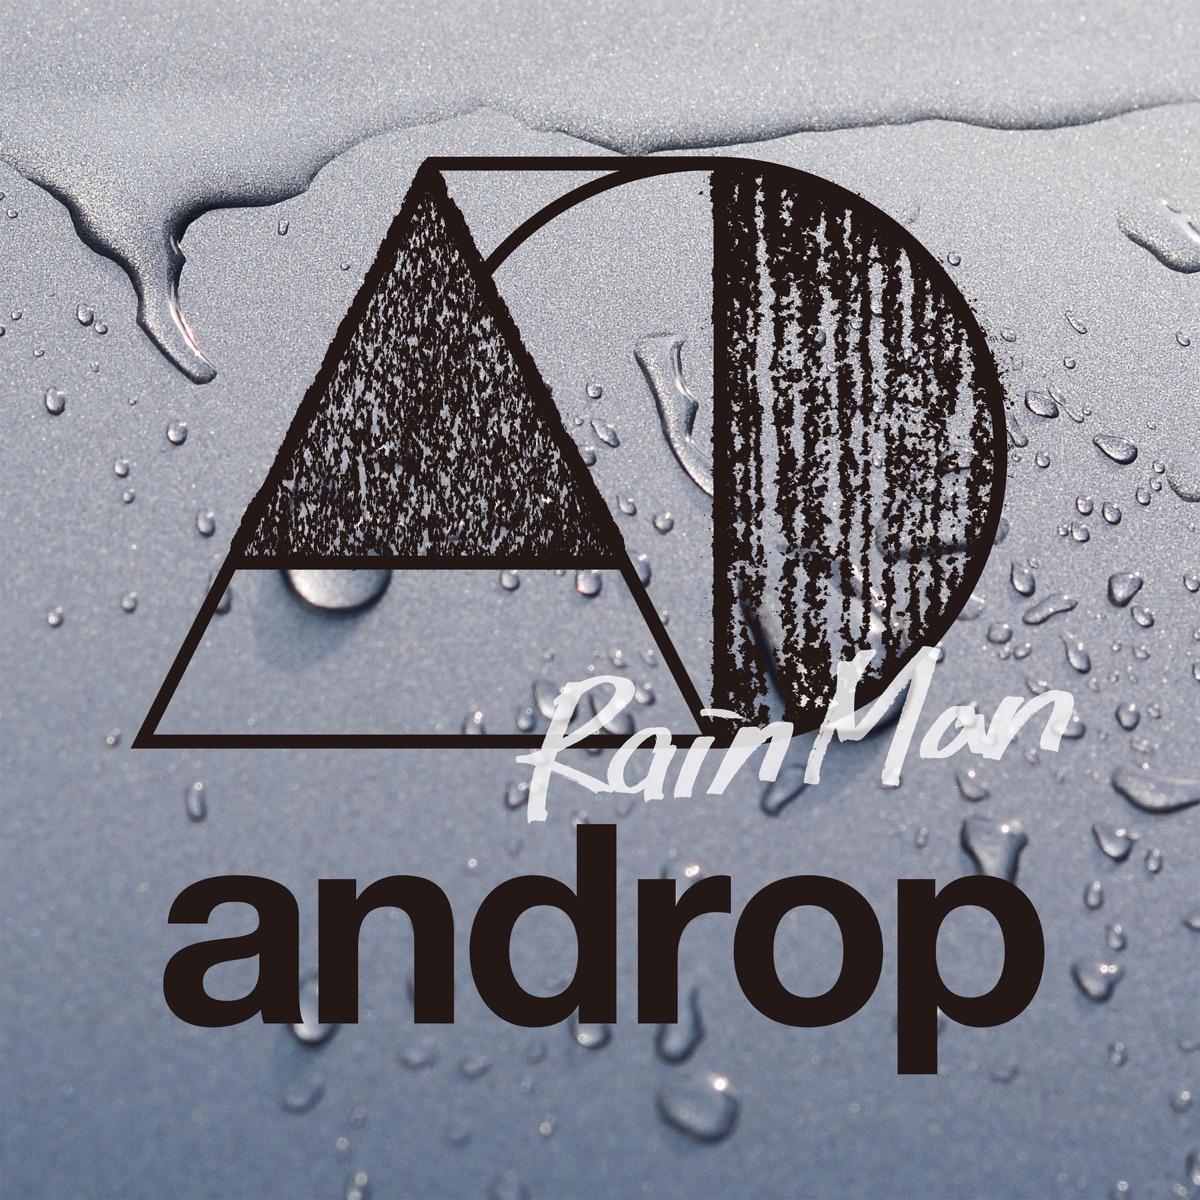 『androp - RainMan』収録の『RainMan』ジャケット